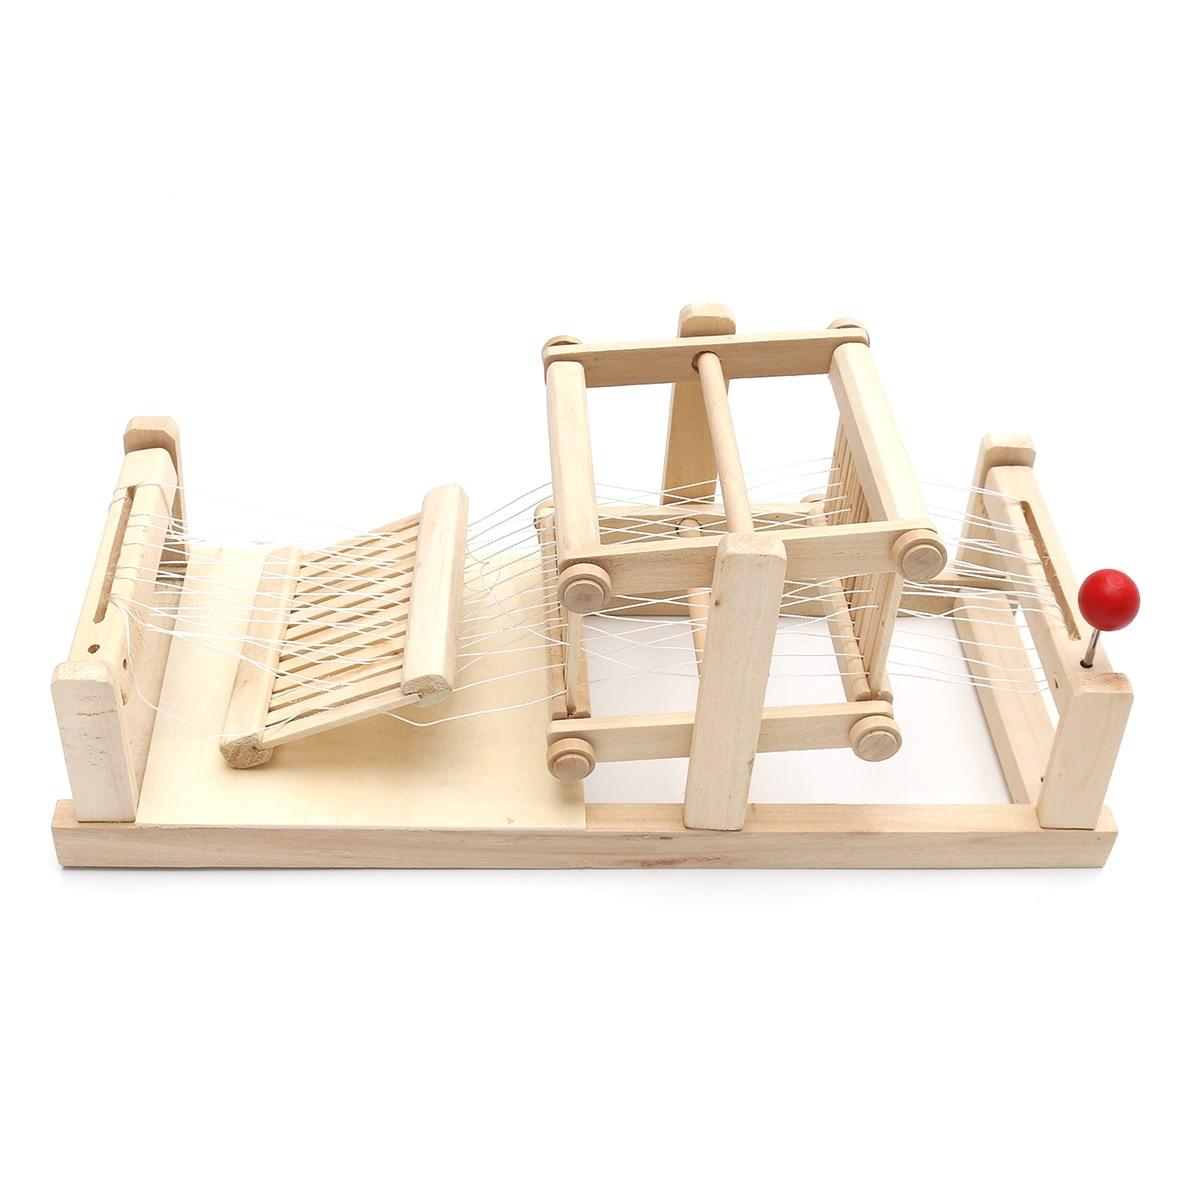 Madera Telar Tradicional China Mano Mesa Modelo De Comprar Máquina P8wOnk0